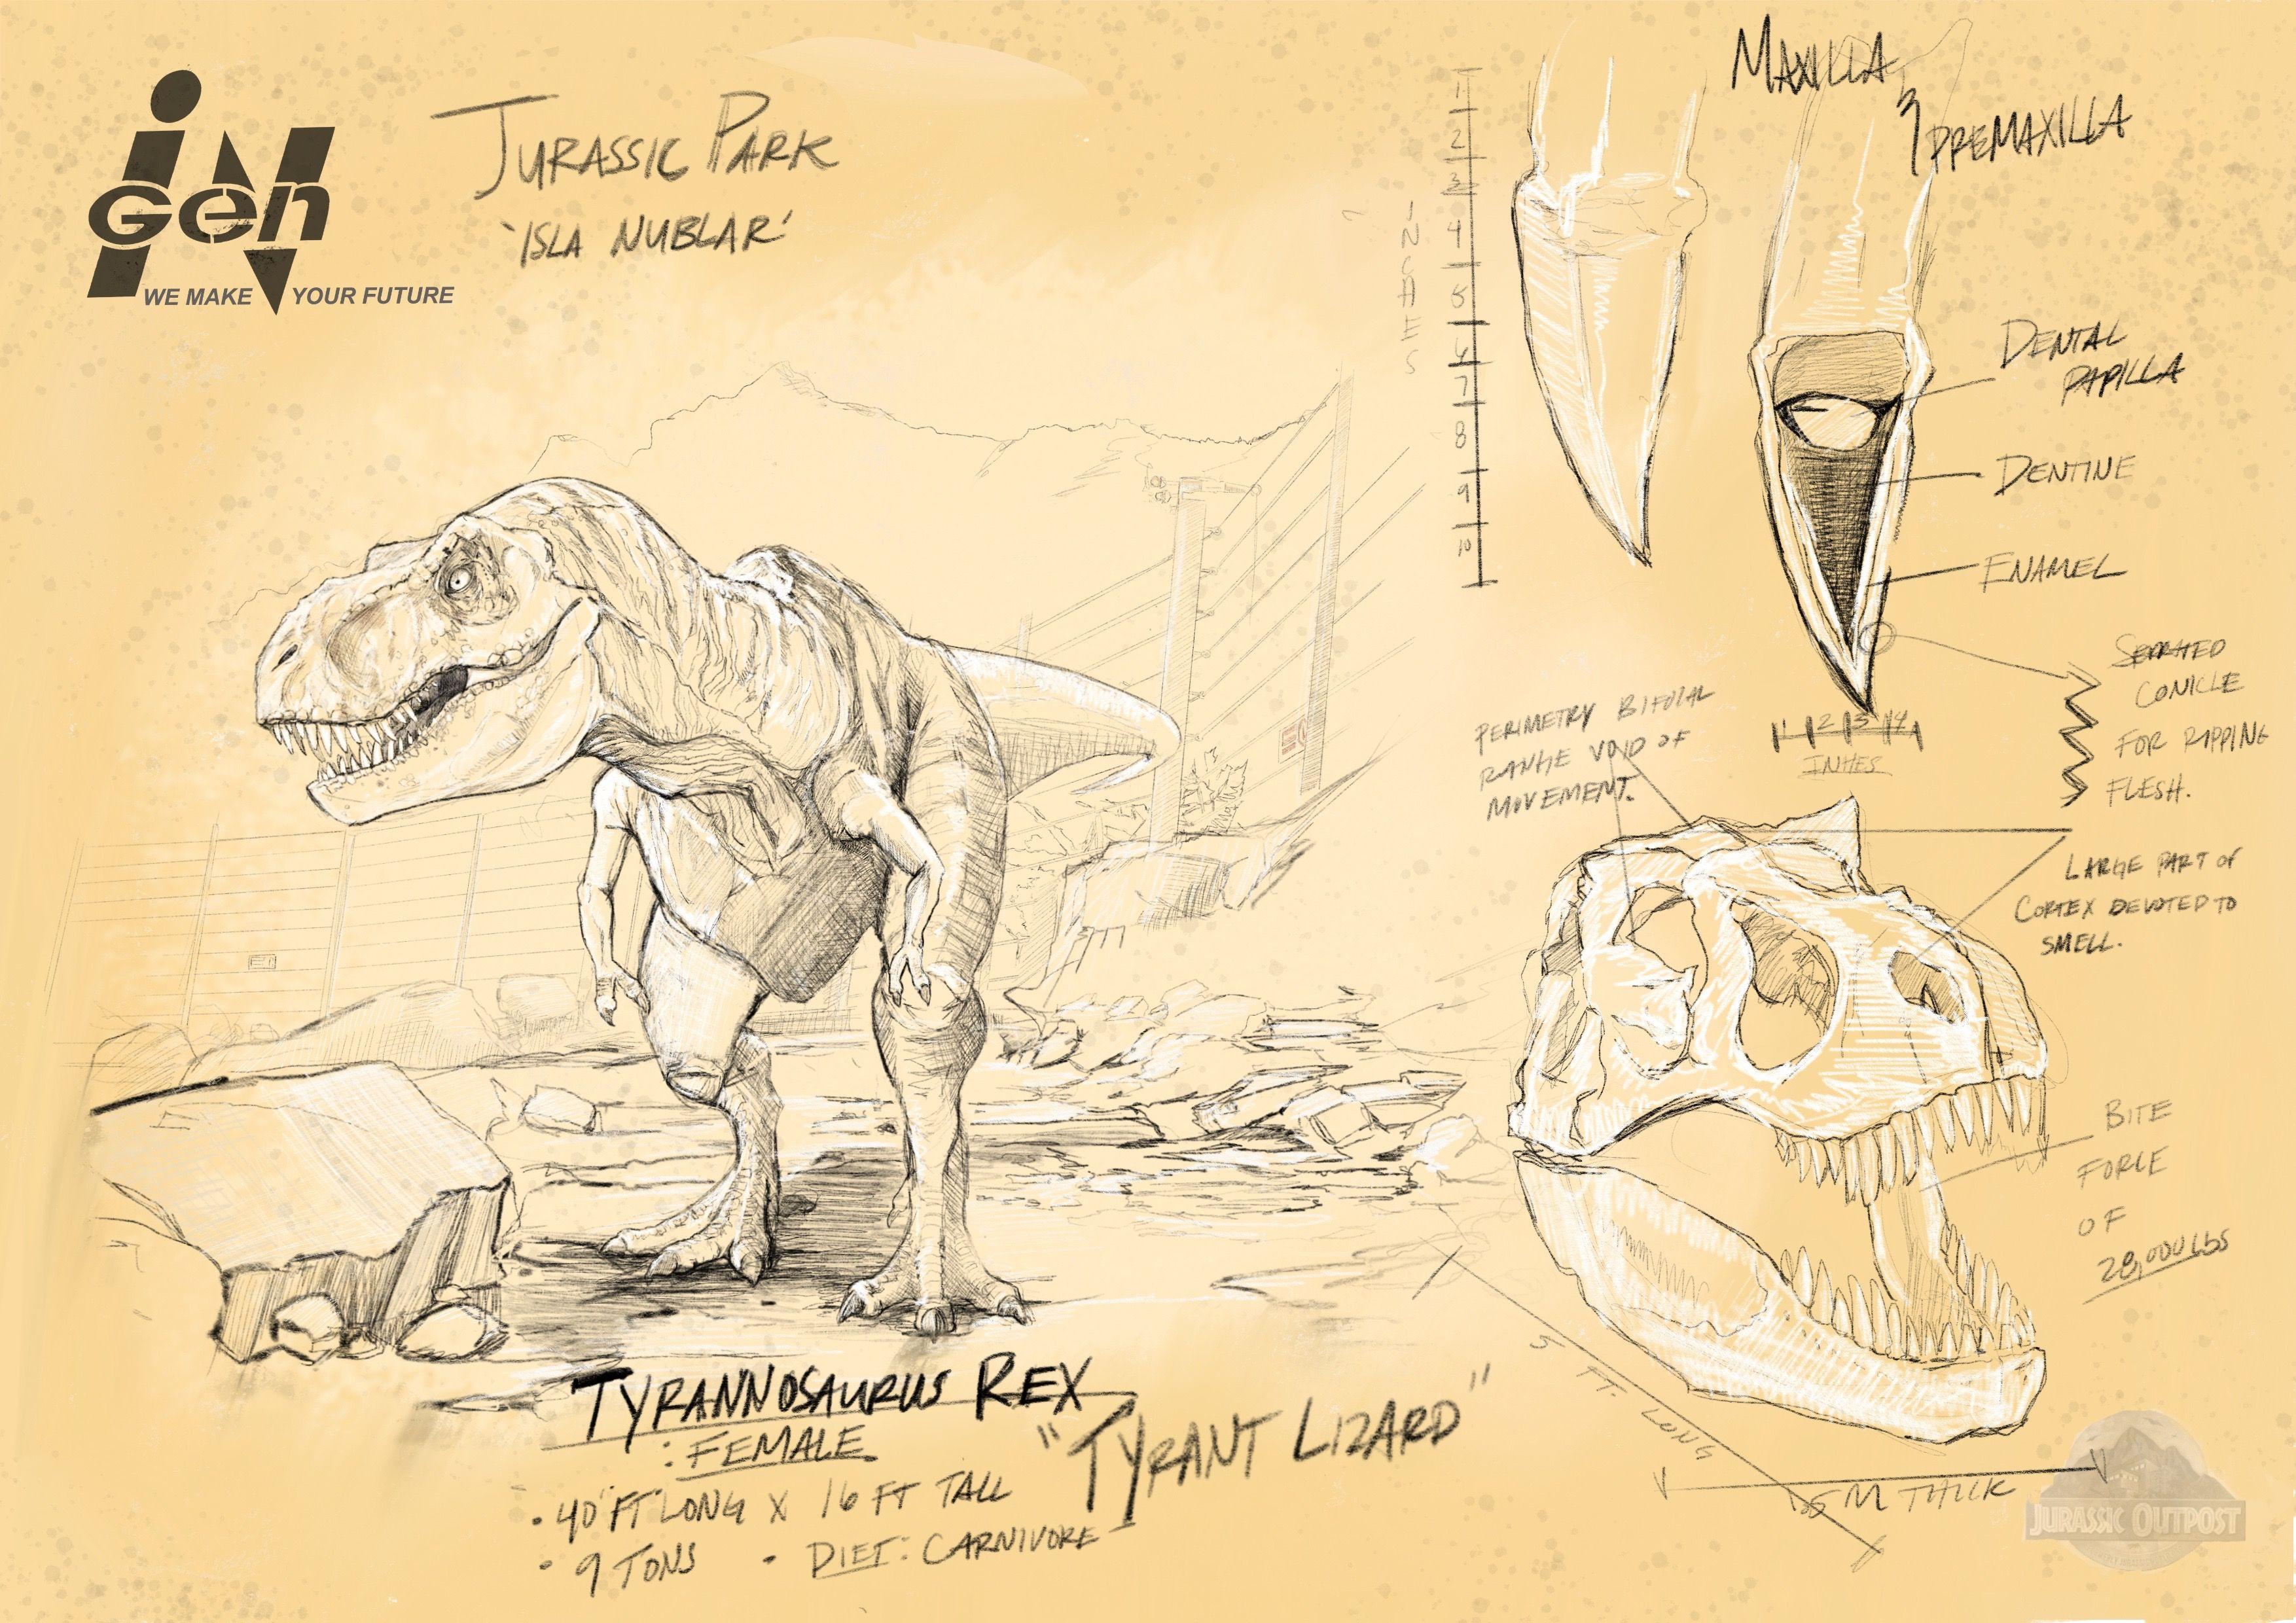 Jurassic park card 3 by chicagocubsfan24 on deviantart - 389 Best Jurrasic Park Images On Pinterest Jurassic Park World Dinosaurs And Concept Art